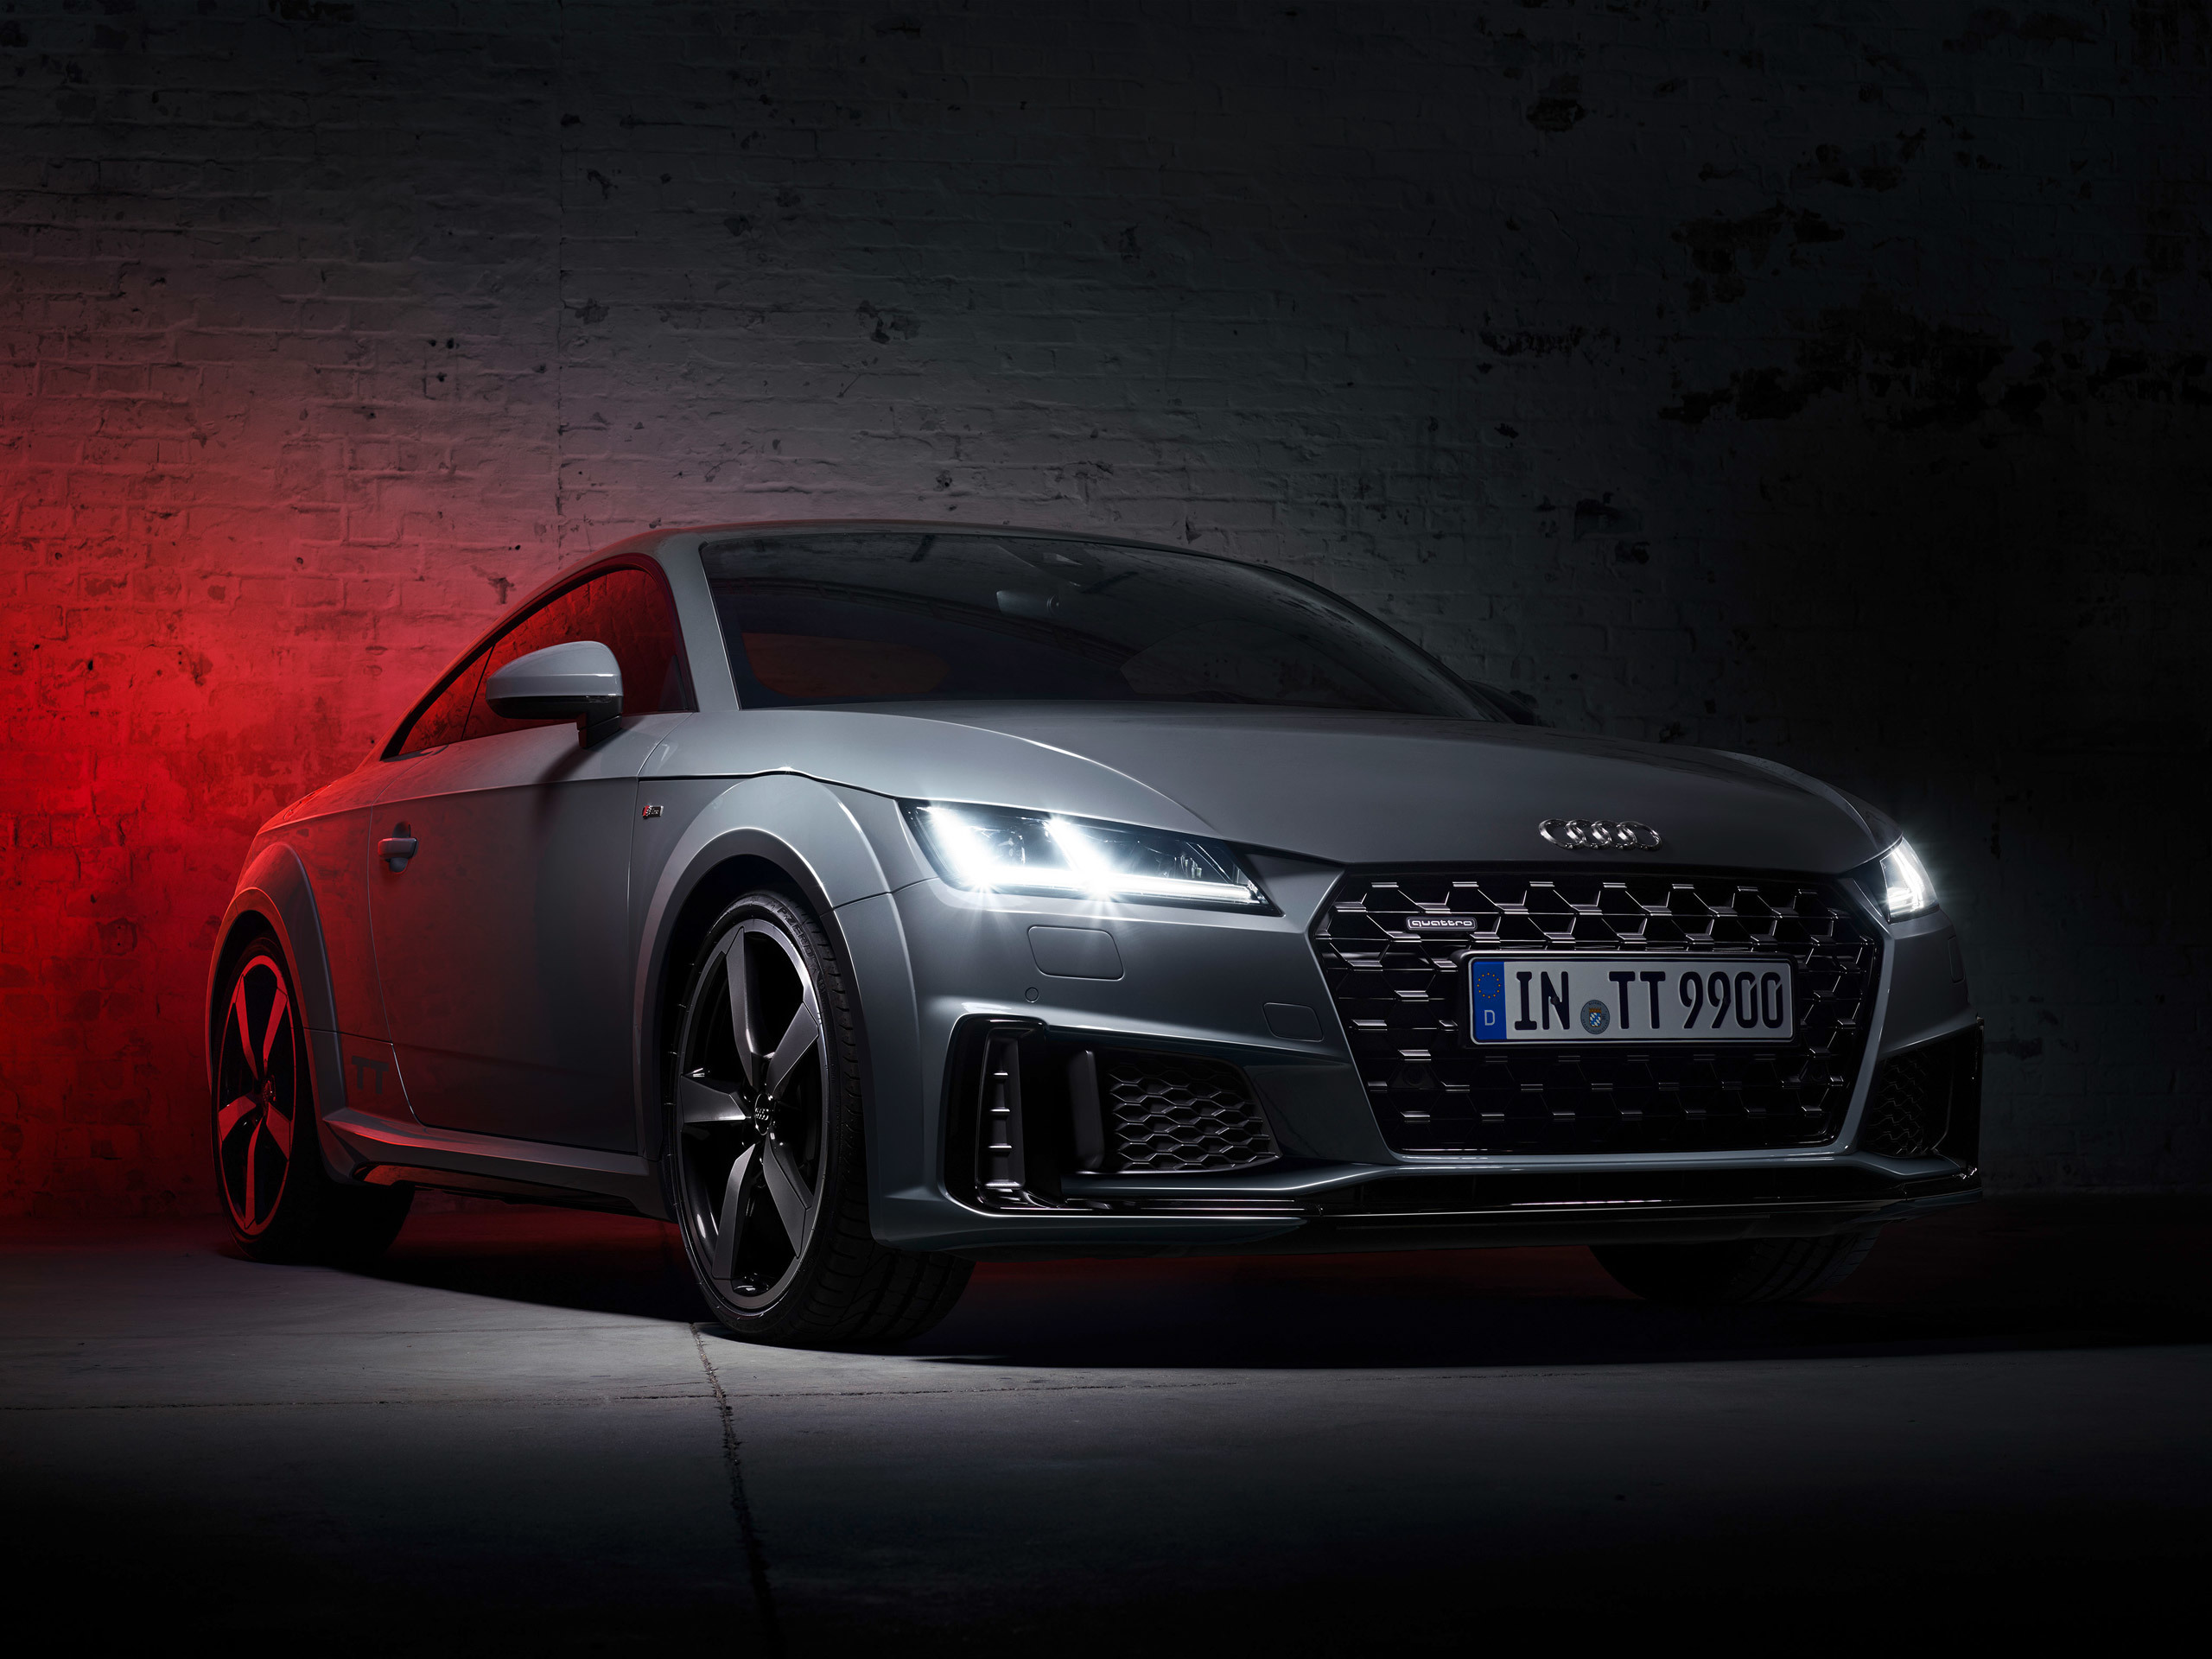 Audi Tt Quantum Gray Edition 19 アウディに嵌まる 壁紙画像ブログ